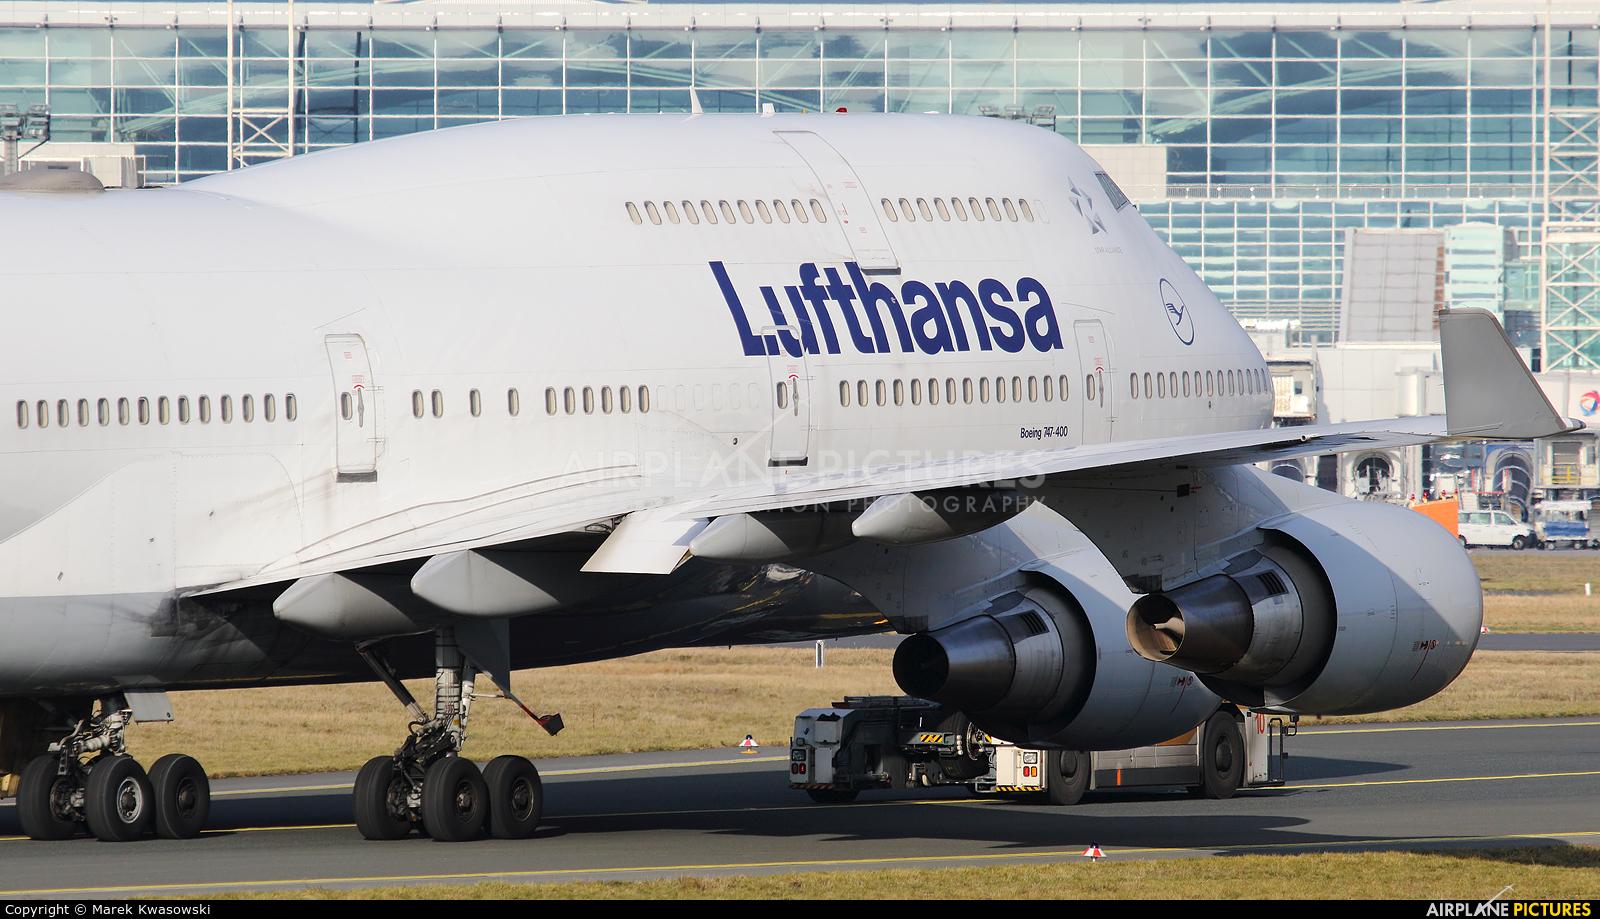 Lufthansa D-ABVY aircraft at Frankfurt